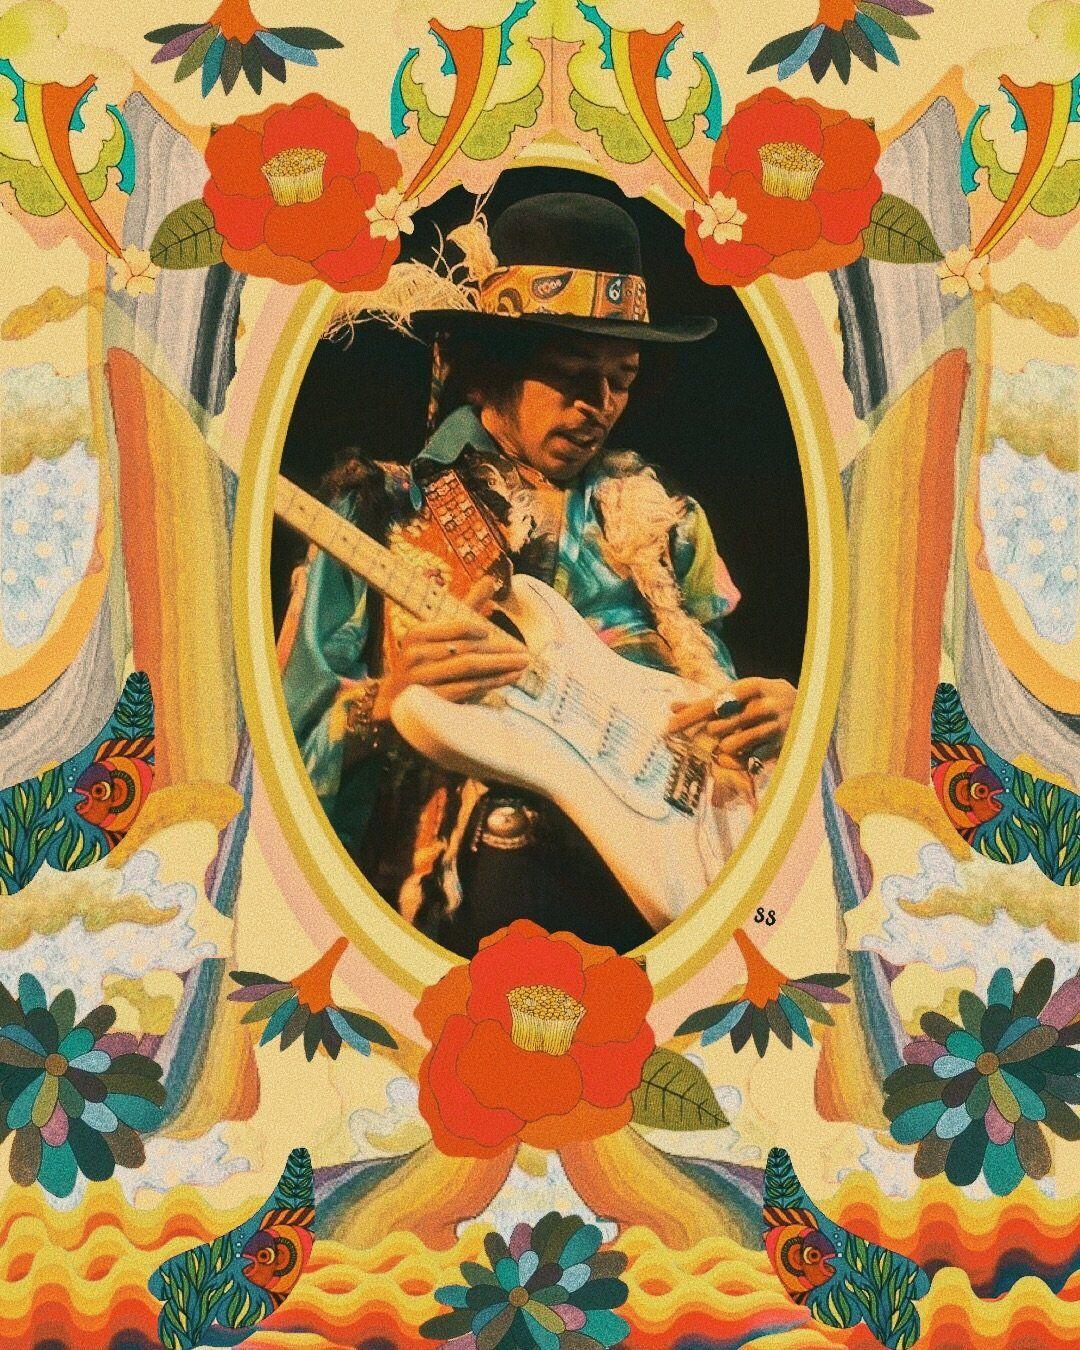 The Jimi Print Jimi Hendrix Art Hippie Art Psychedelic Art